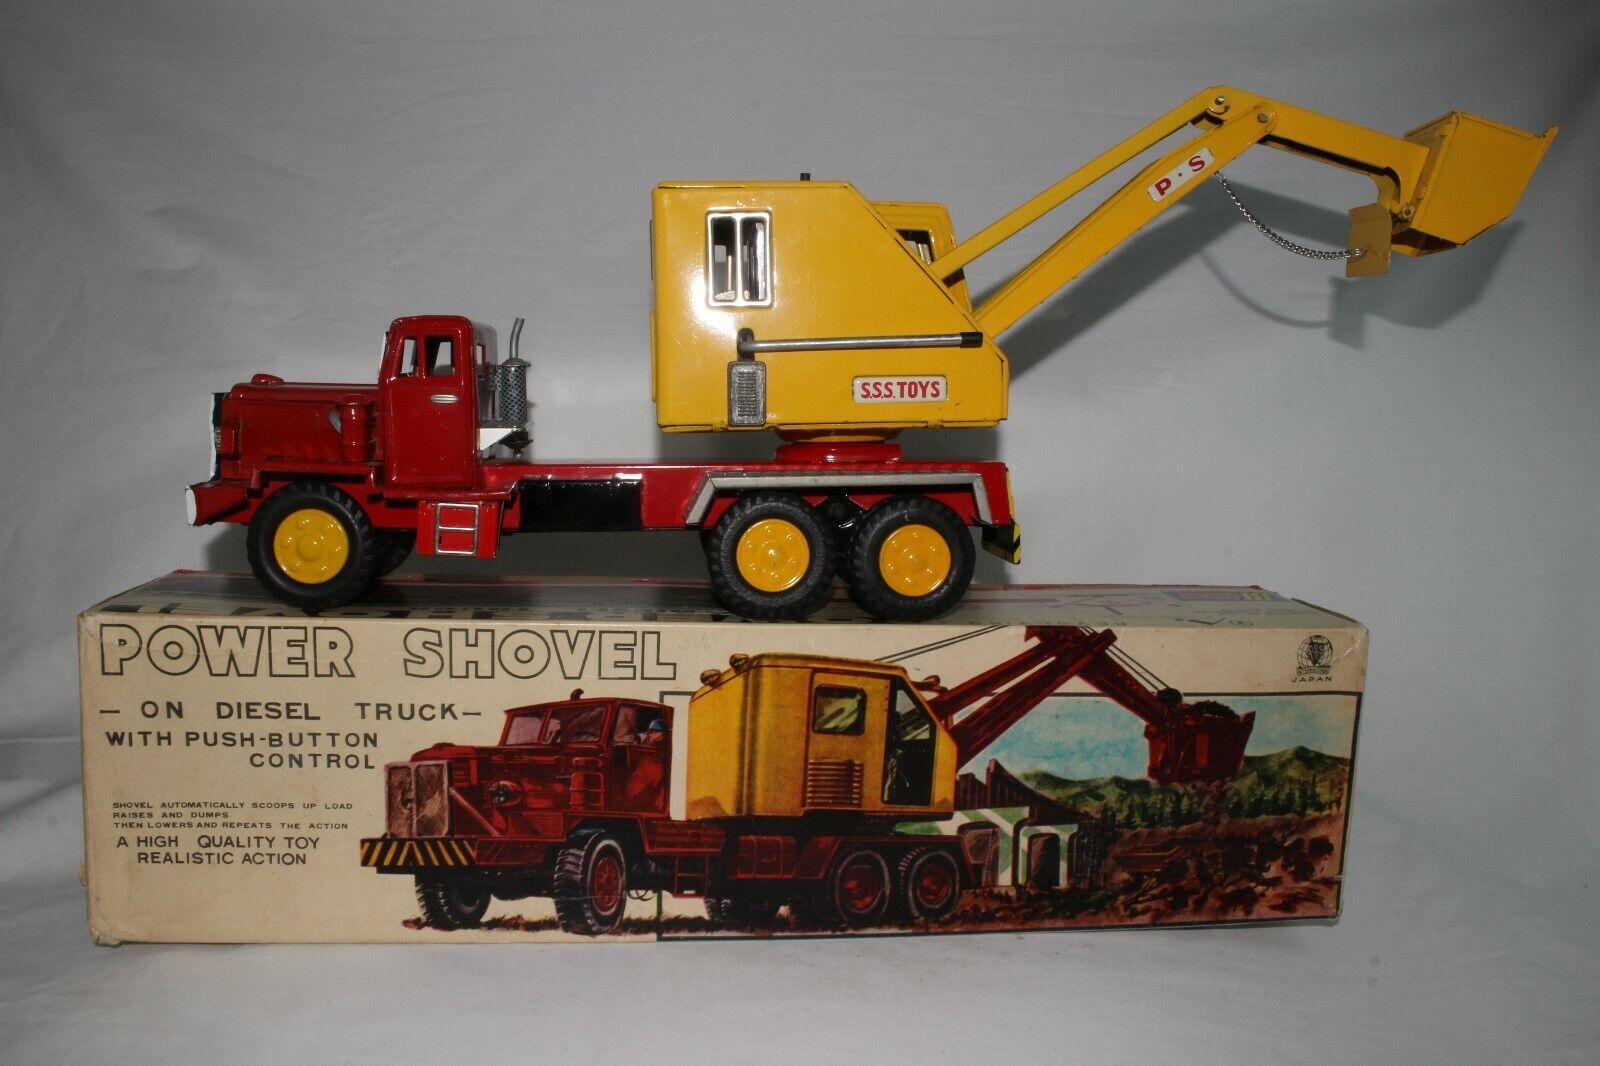 1960's Sss Toys Of Japan Groß Offroad Blech Schaufel Lkw mit Kiste,Schön